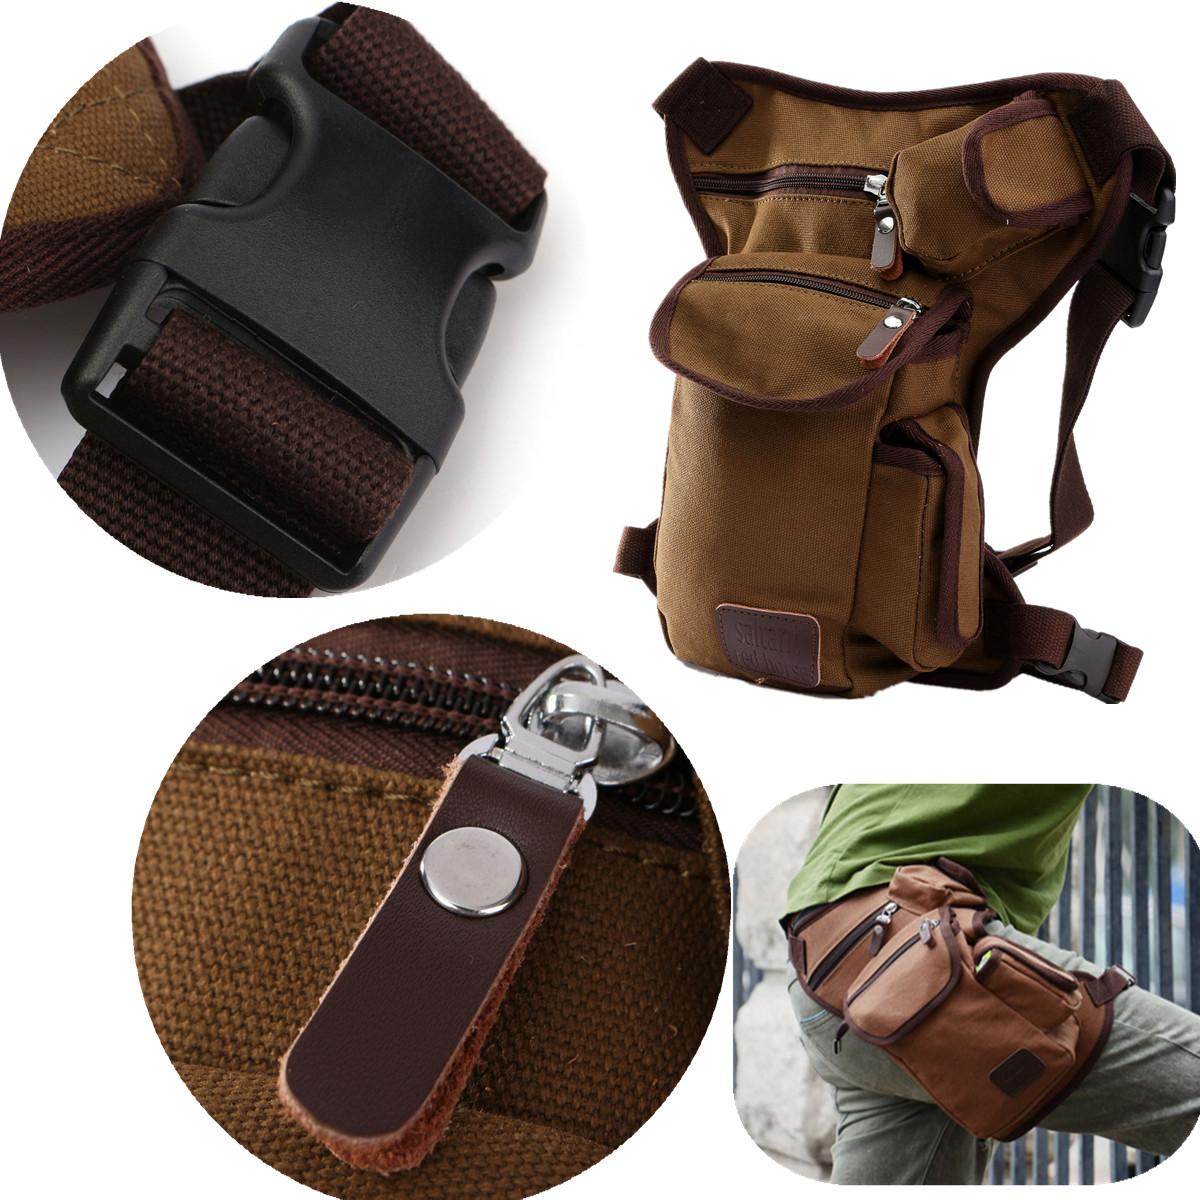 sac sacoche banane ceinture cuisse v lo moto d 39 equitation tactique militaire ebay. Black Bedroom Furniture Sets. Home Design Ideas